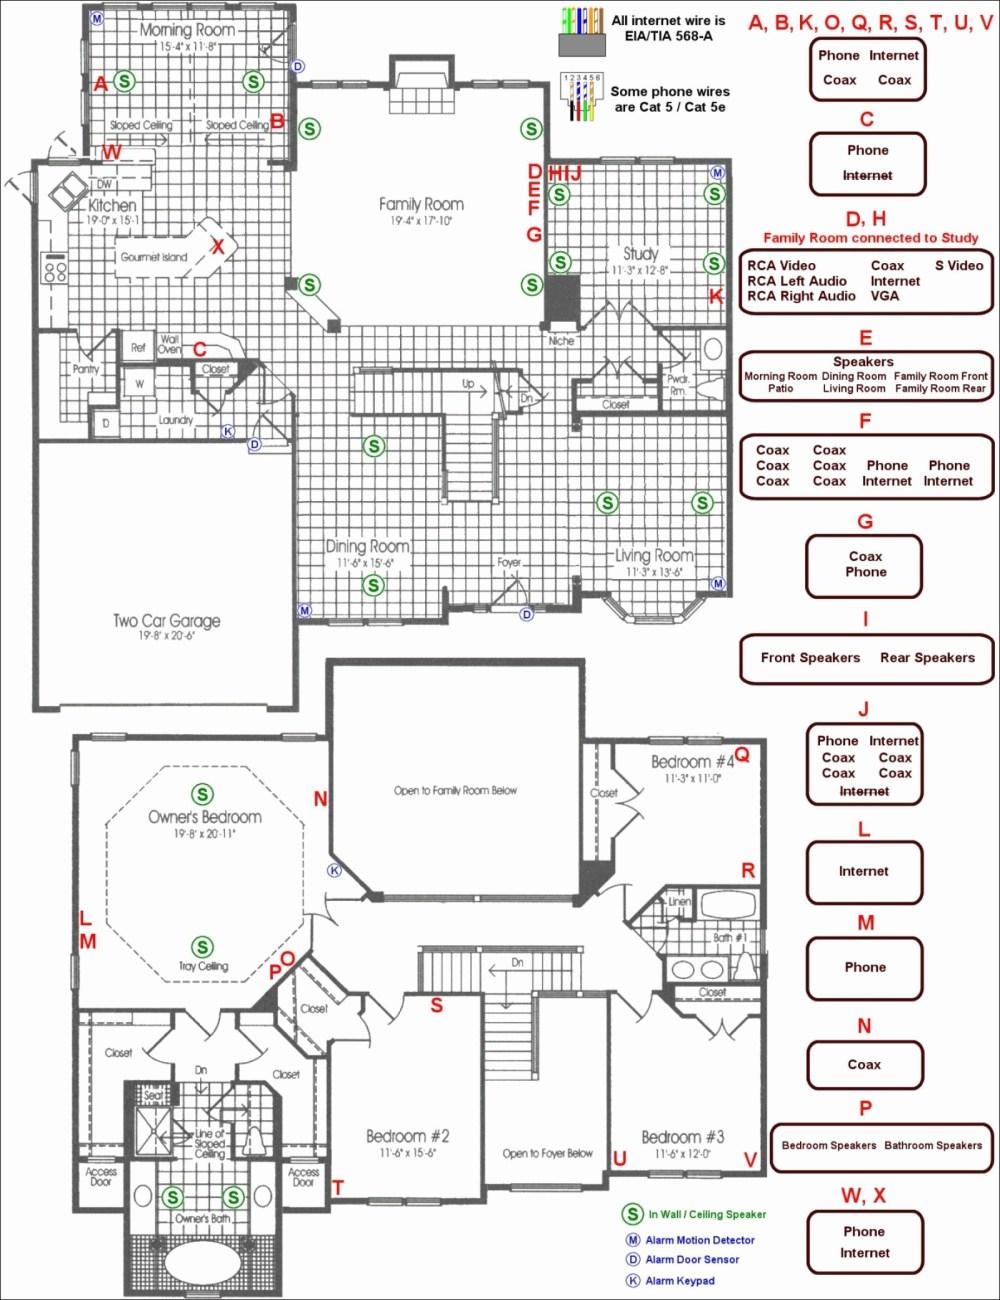 medium resolution of whole house audio system wiring diagram panoramabypatysesma whole house audio system wiring diagram